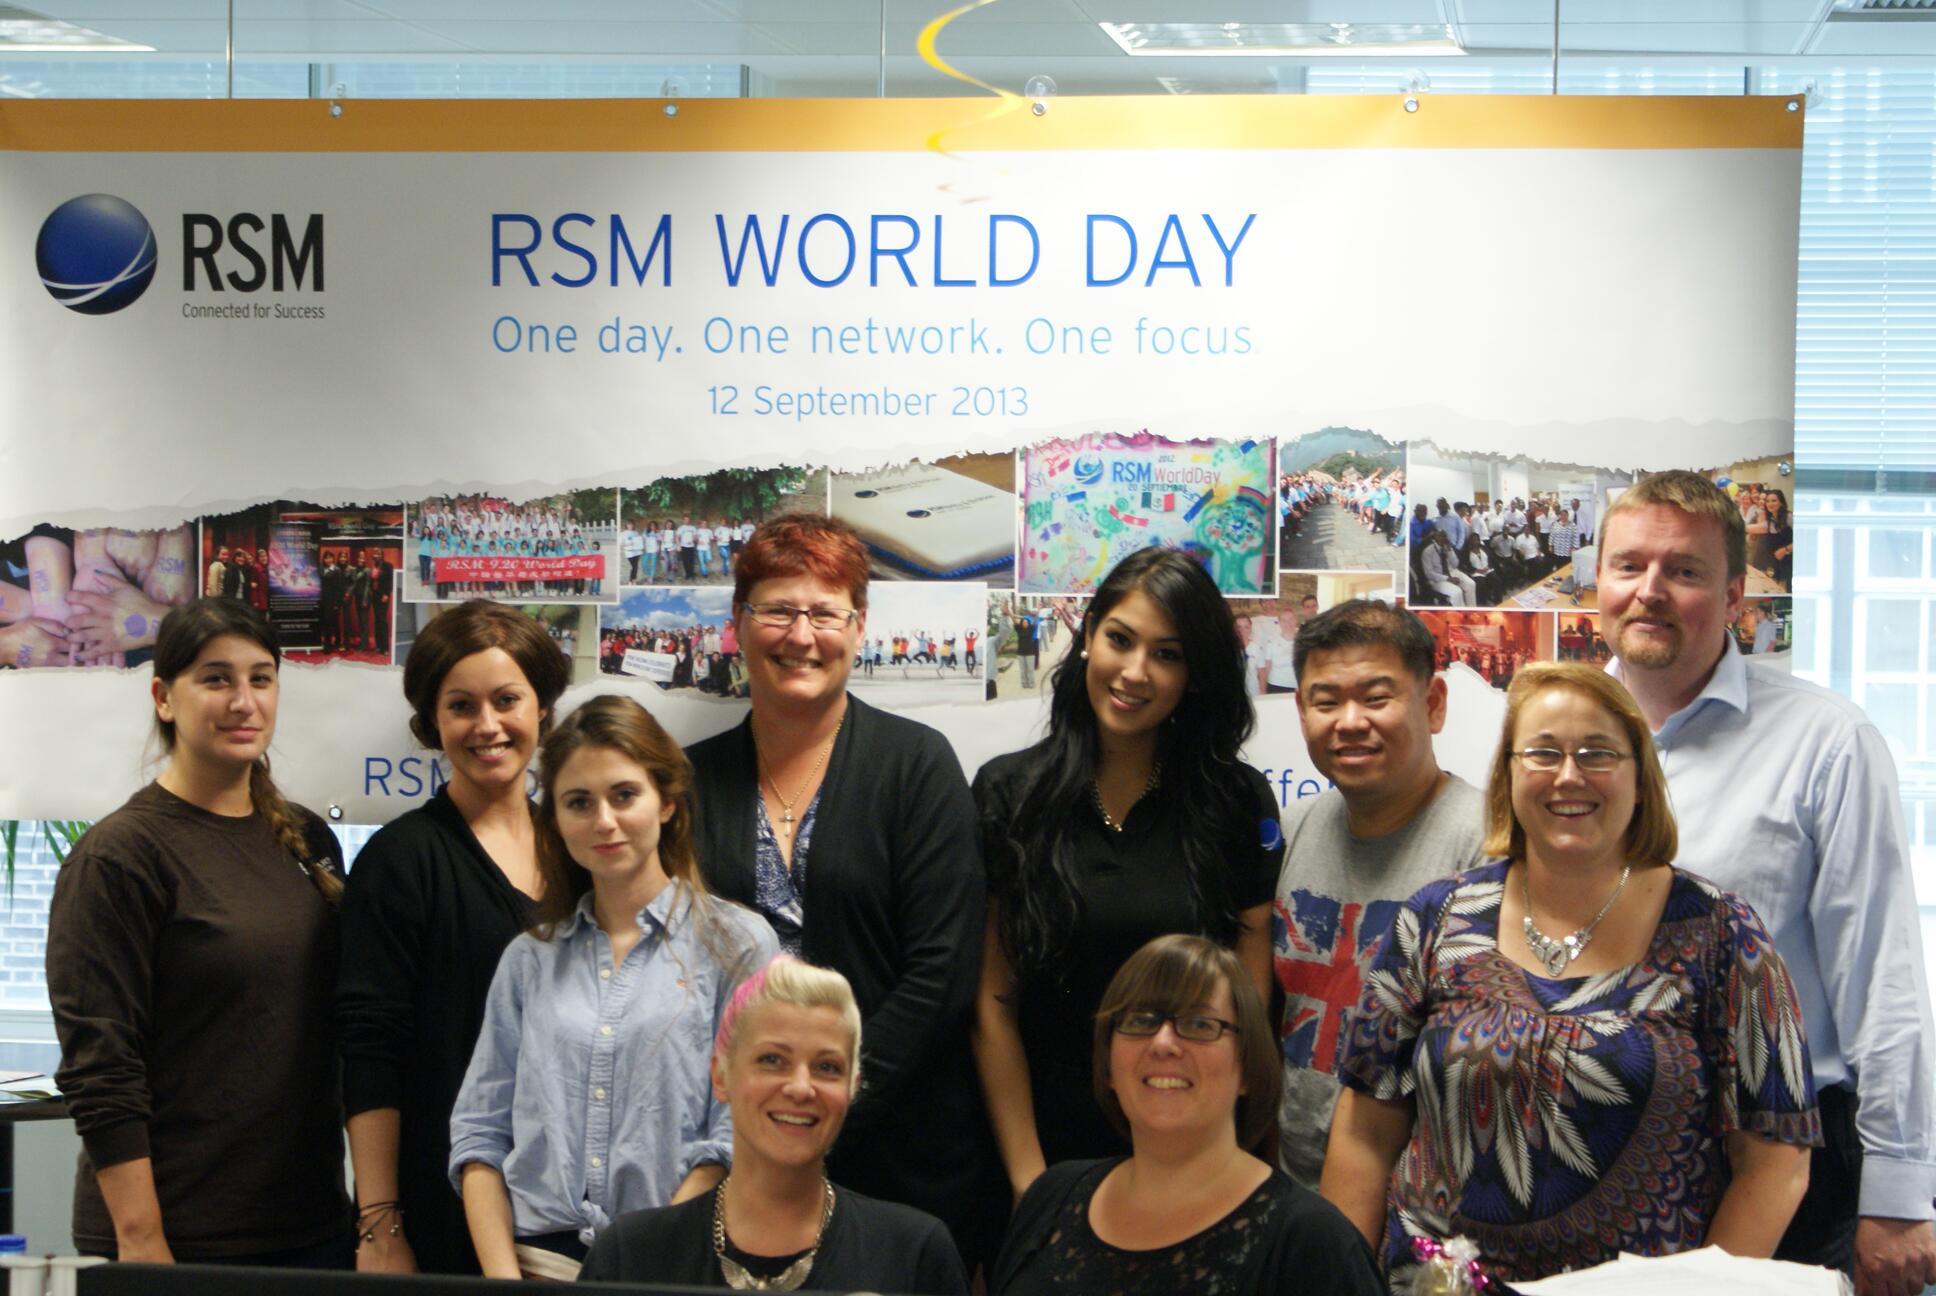 RSM Executive Office celebrating RSM World Day 2013 #rsmworldday http://t.co/rxs4sVuB24